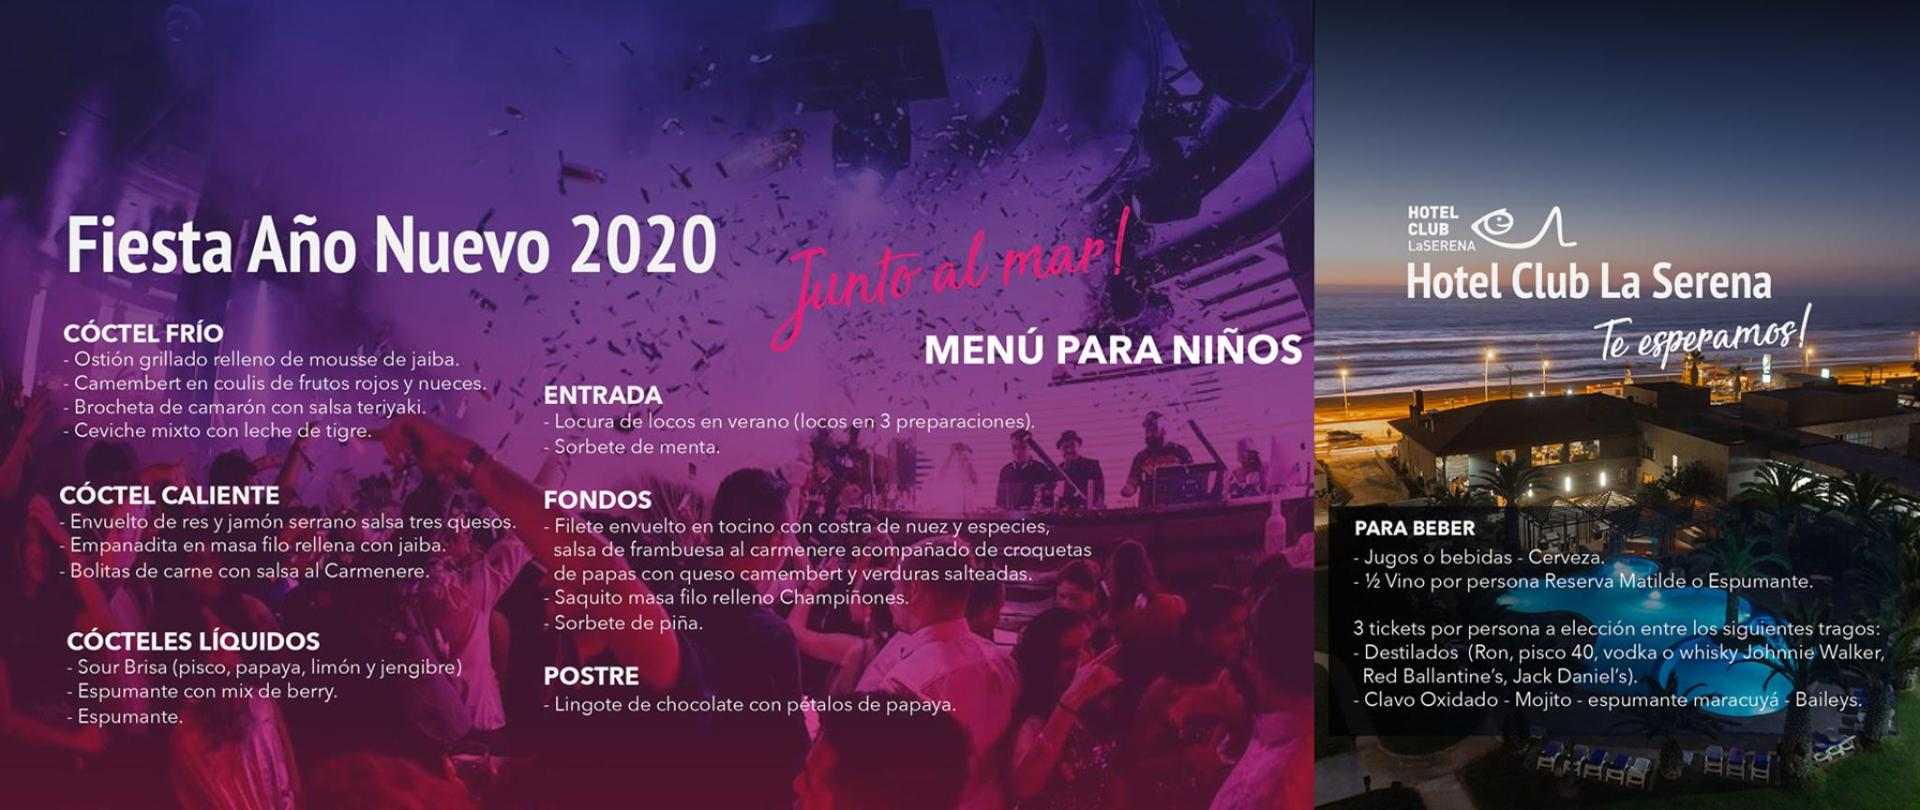 ano-nuevo-2020.jpg